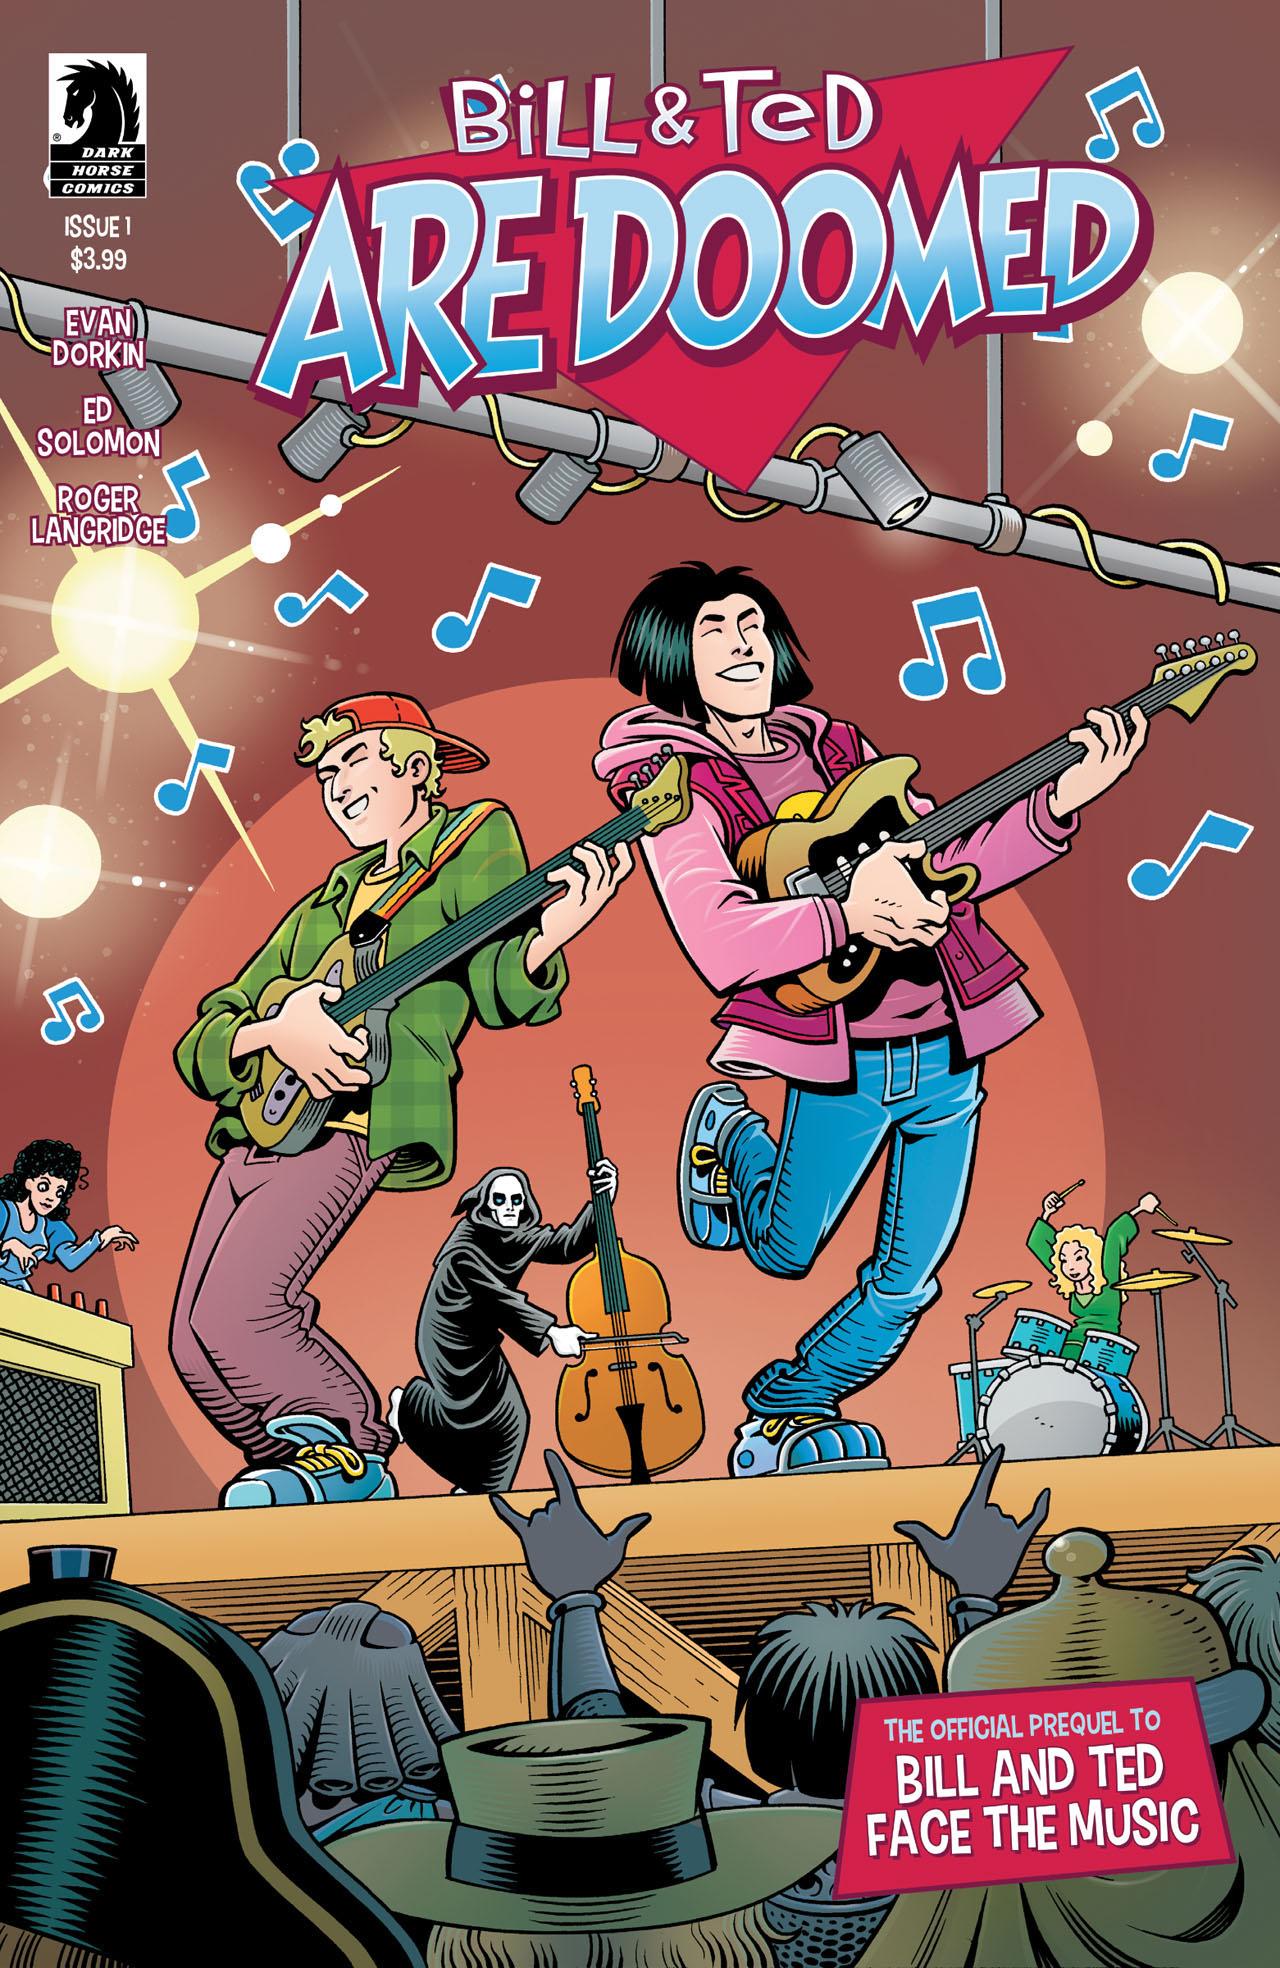 Portada de Bill & Ted Are Doomed #1 (2020). Arte por Roger Langridge. Imagen: Dark Horse Comics